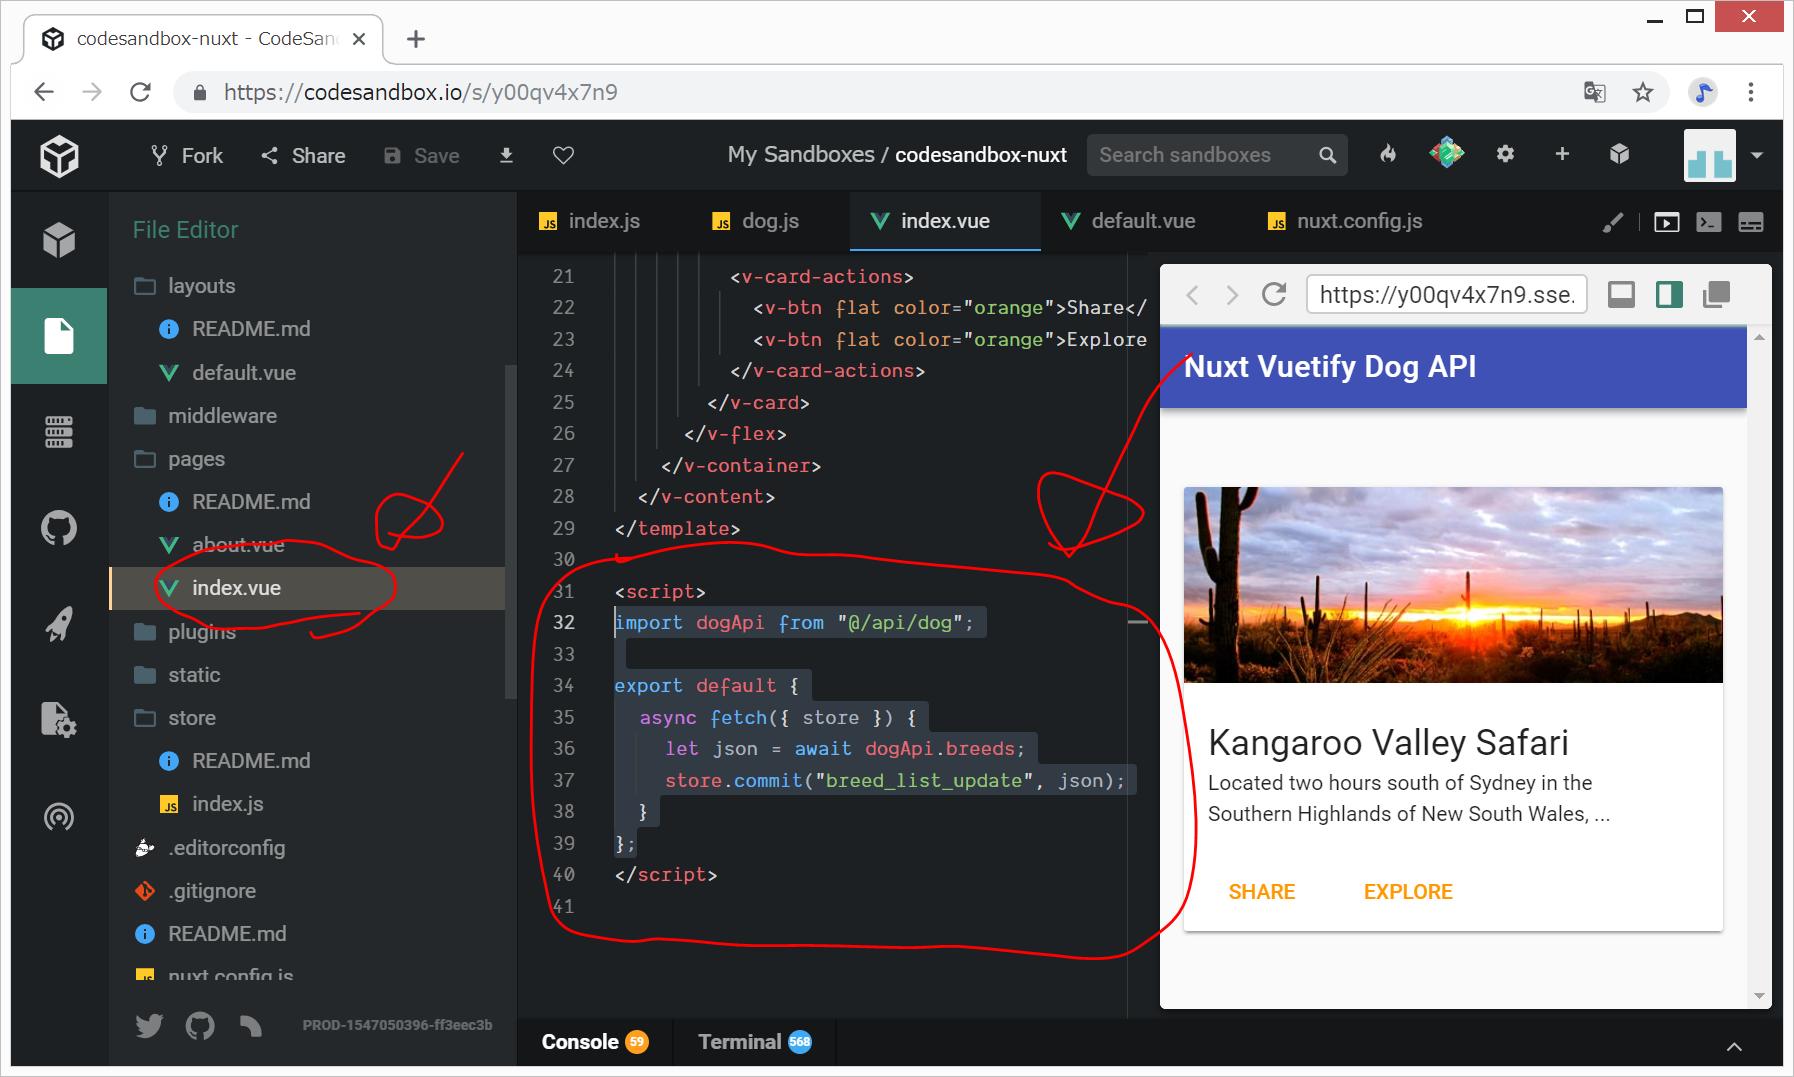 19 nuxt jsで画像一覧アプリ:nuxt_vuex_codesandboxメモ [サル